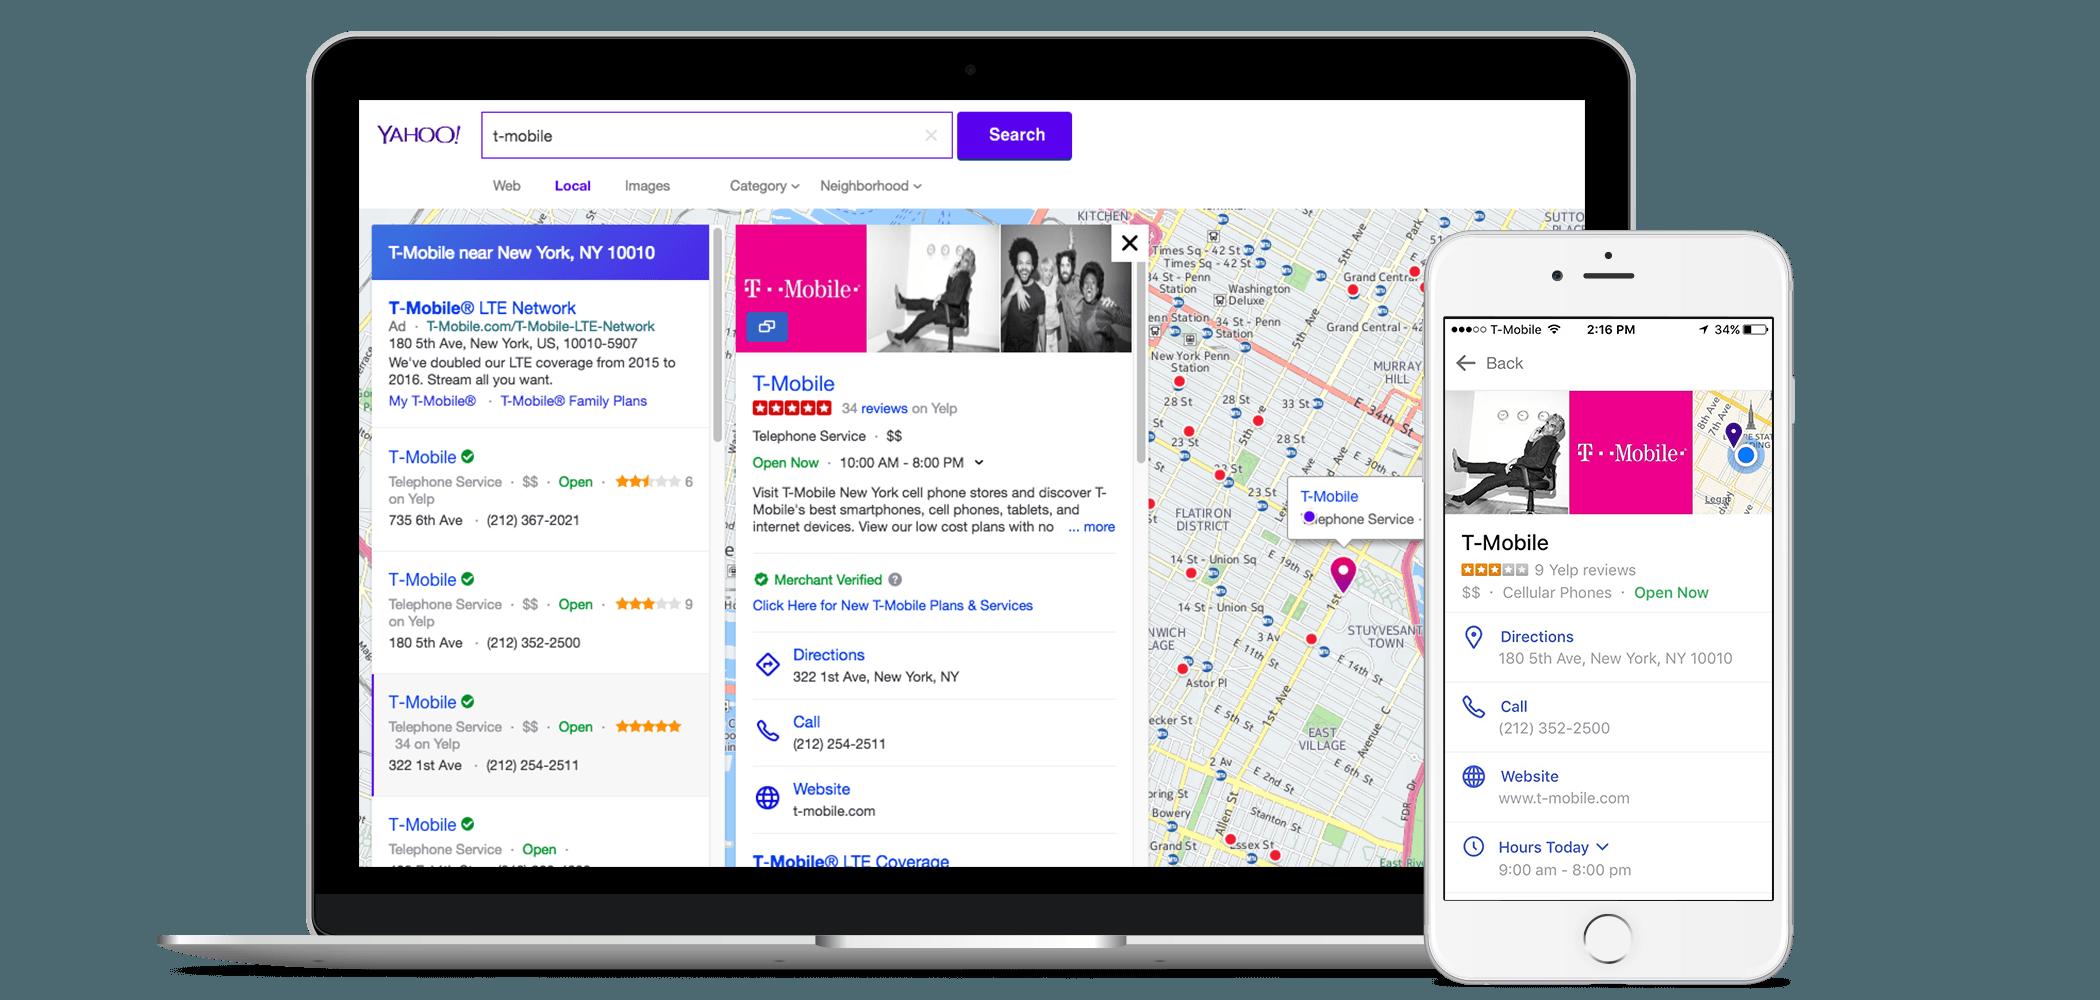 Yahoo!   Update Your Yahoo! Business Listings - Yext